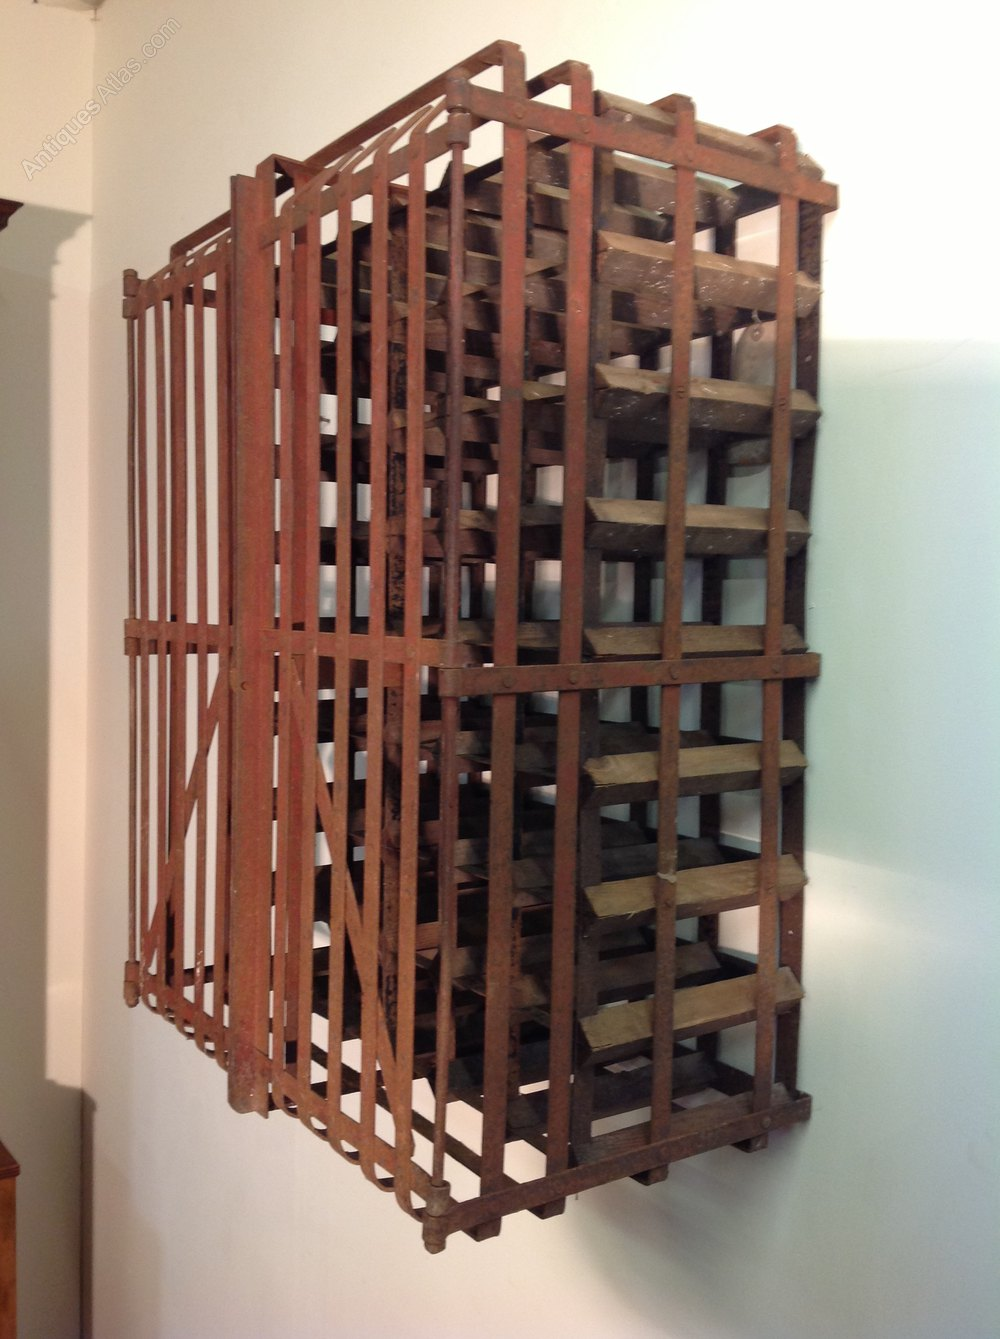 Country House Wine Rack Antique Wine Racks ... - Country House Wine Rack - Antiques Atlas